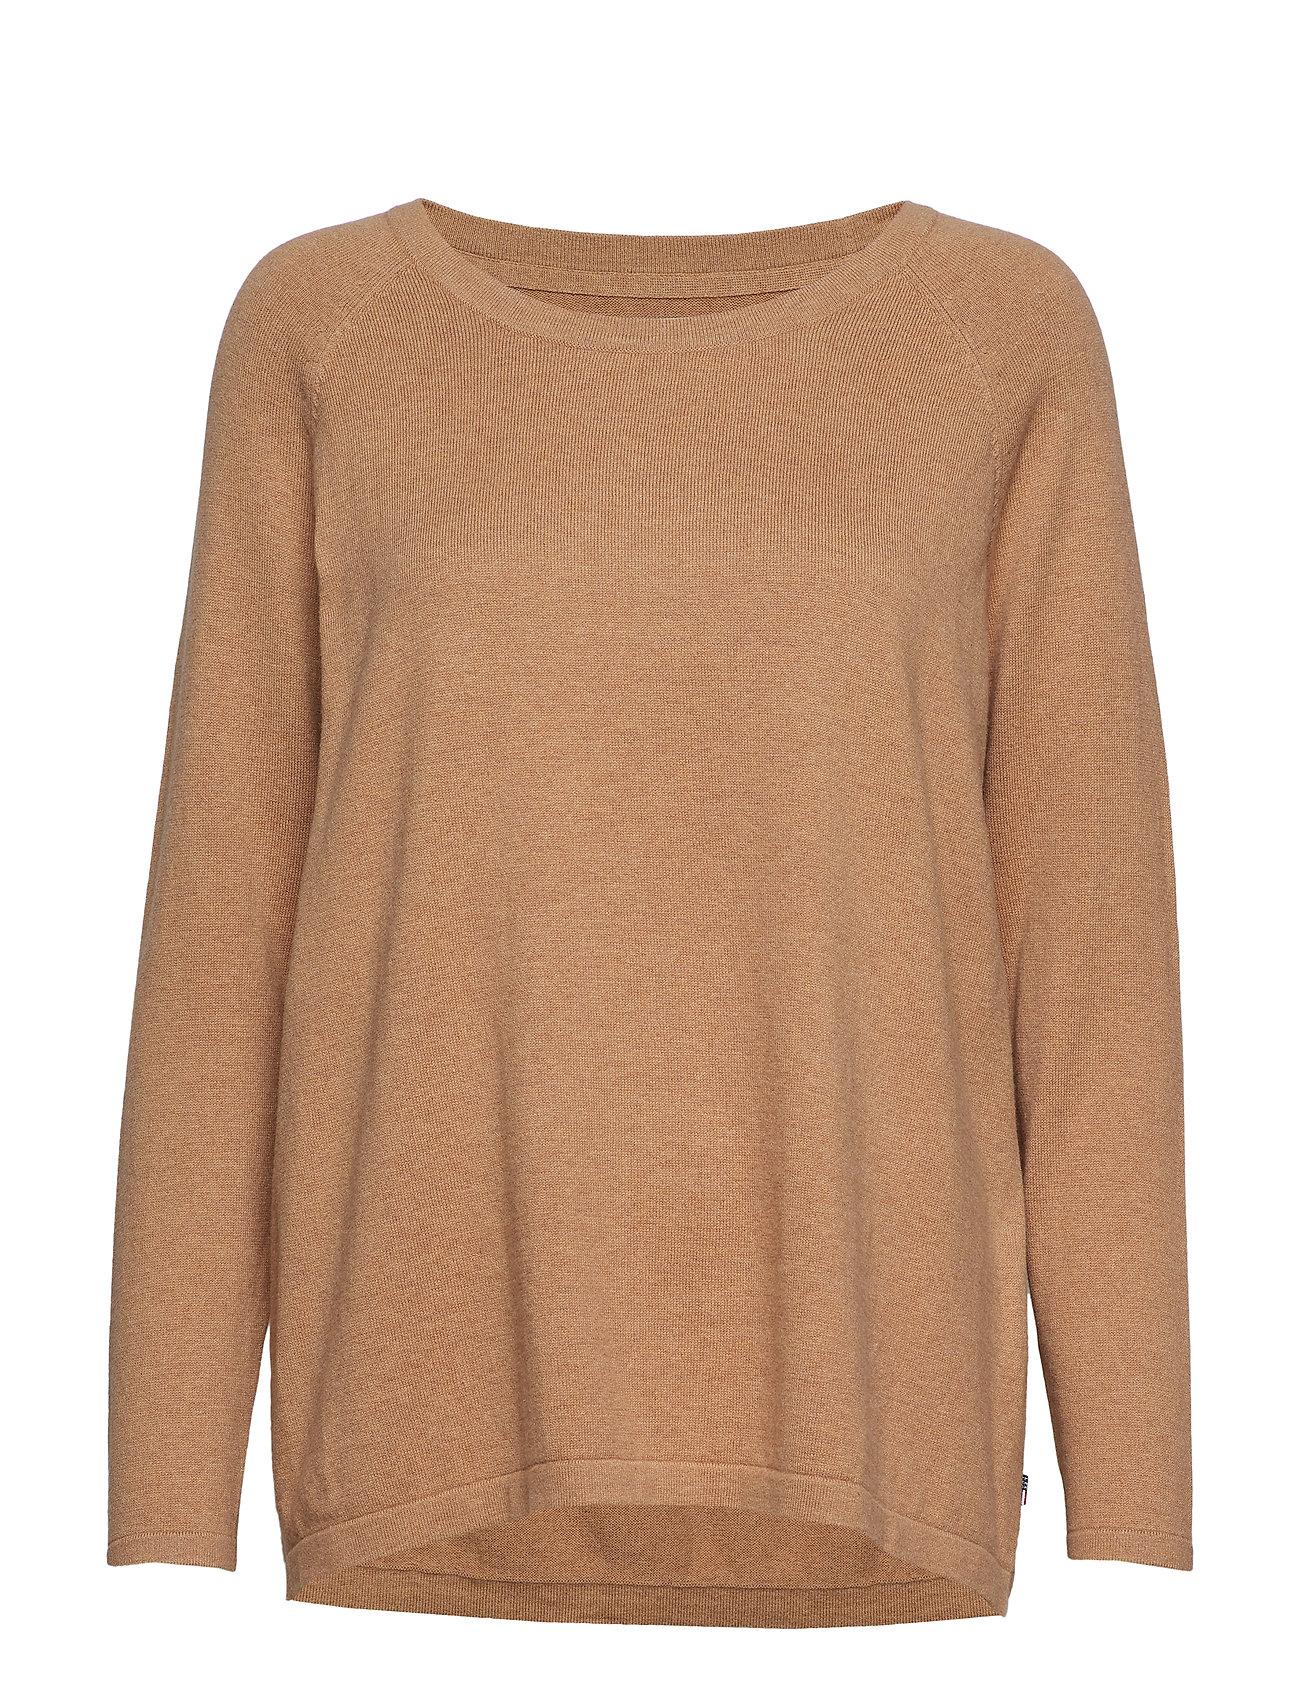 Sweaterbeige Clothing MelangeLexington MelangeLexington Lea Lea Sweaterbeige Sweaterbeige MelangeLexington Lea Clothing Clothing Lea RAj534qL